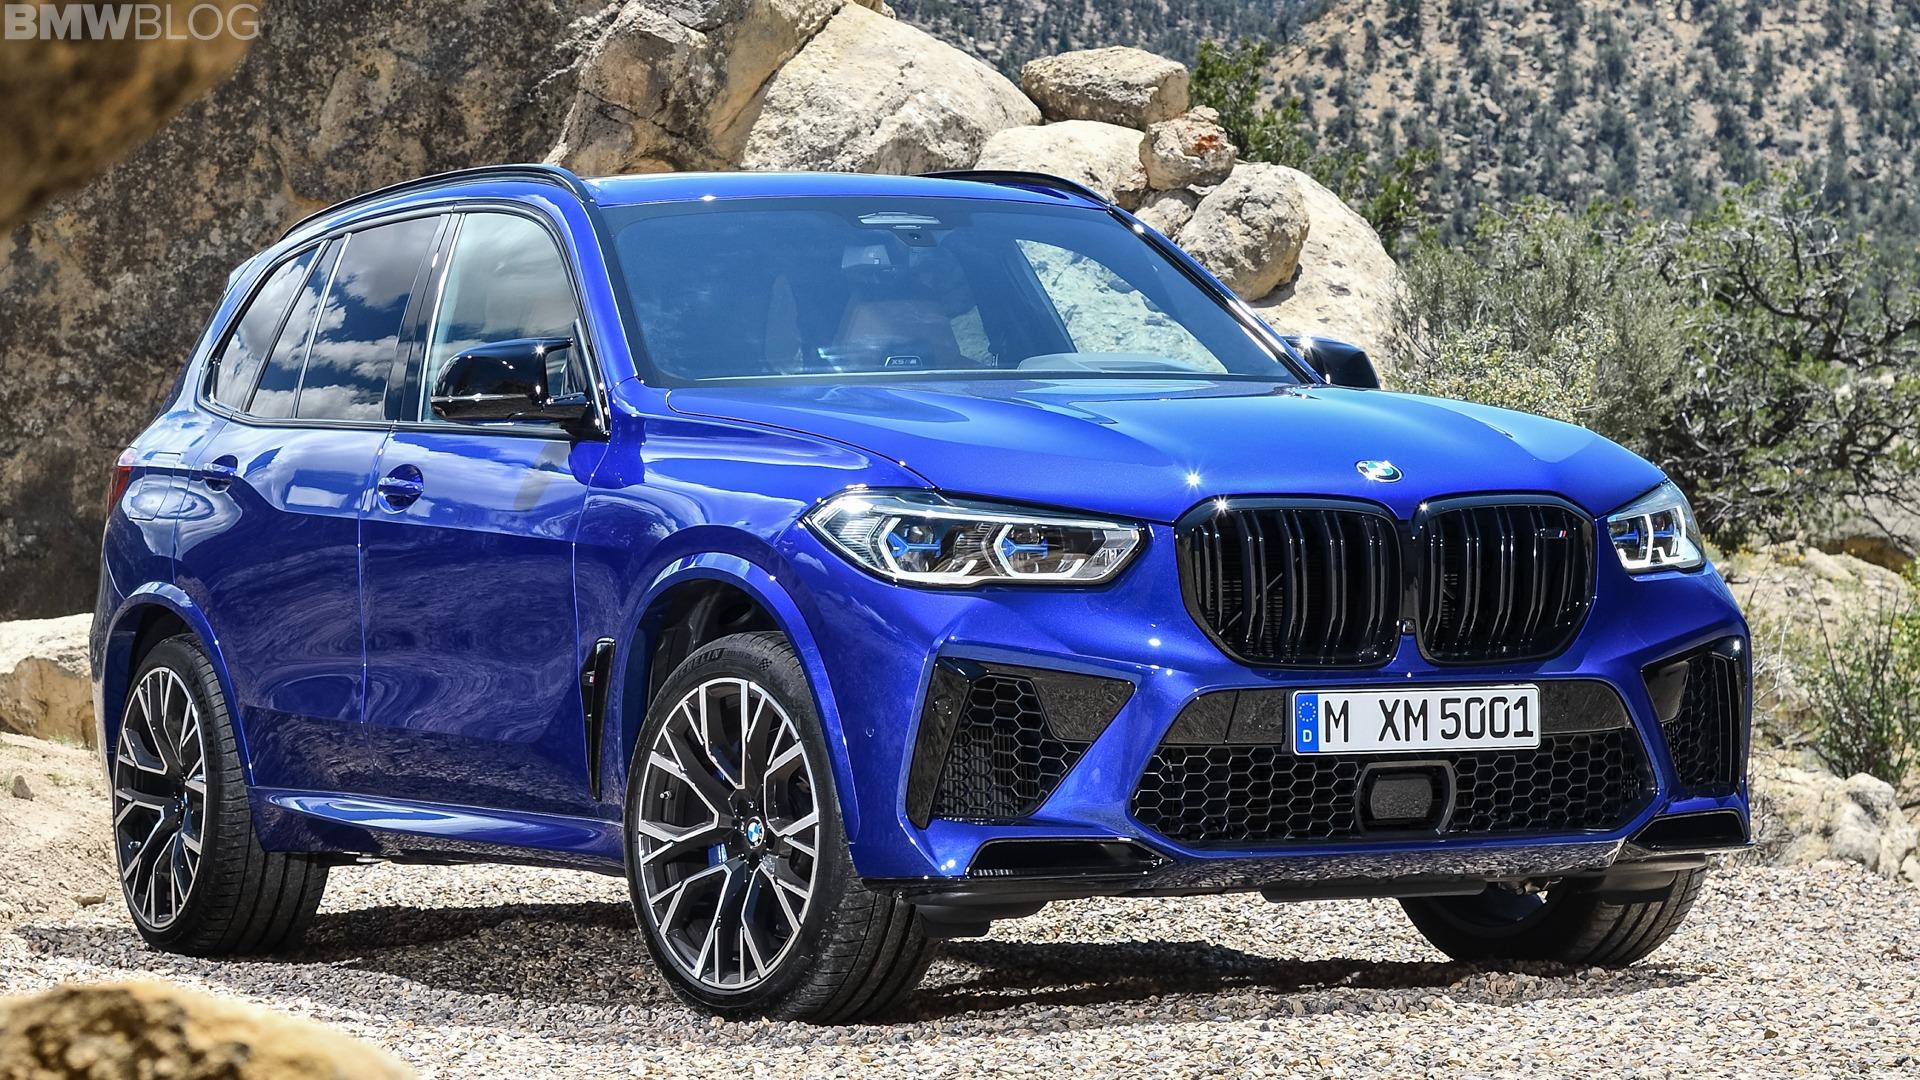 BMW X5 M Comparison 4 of 10